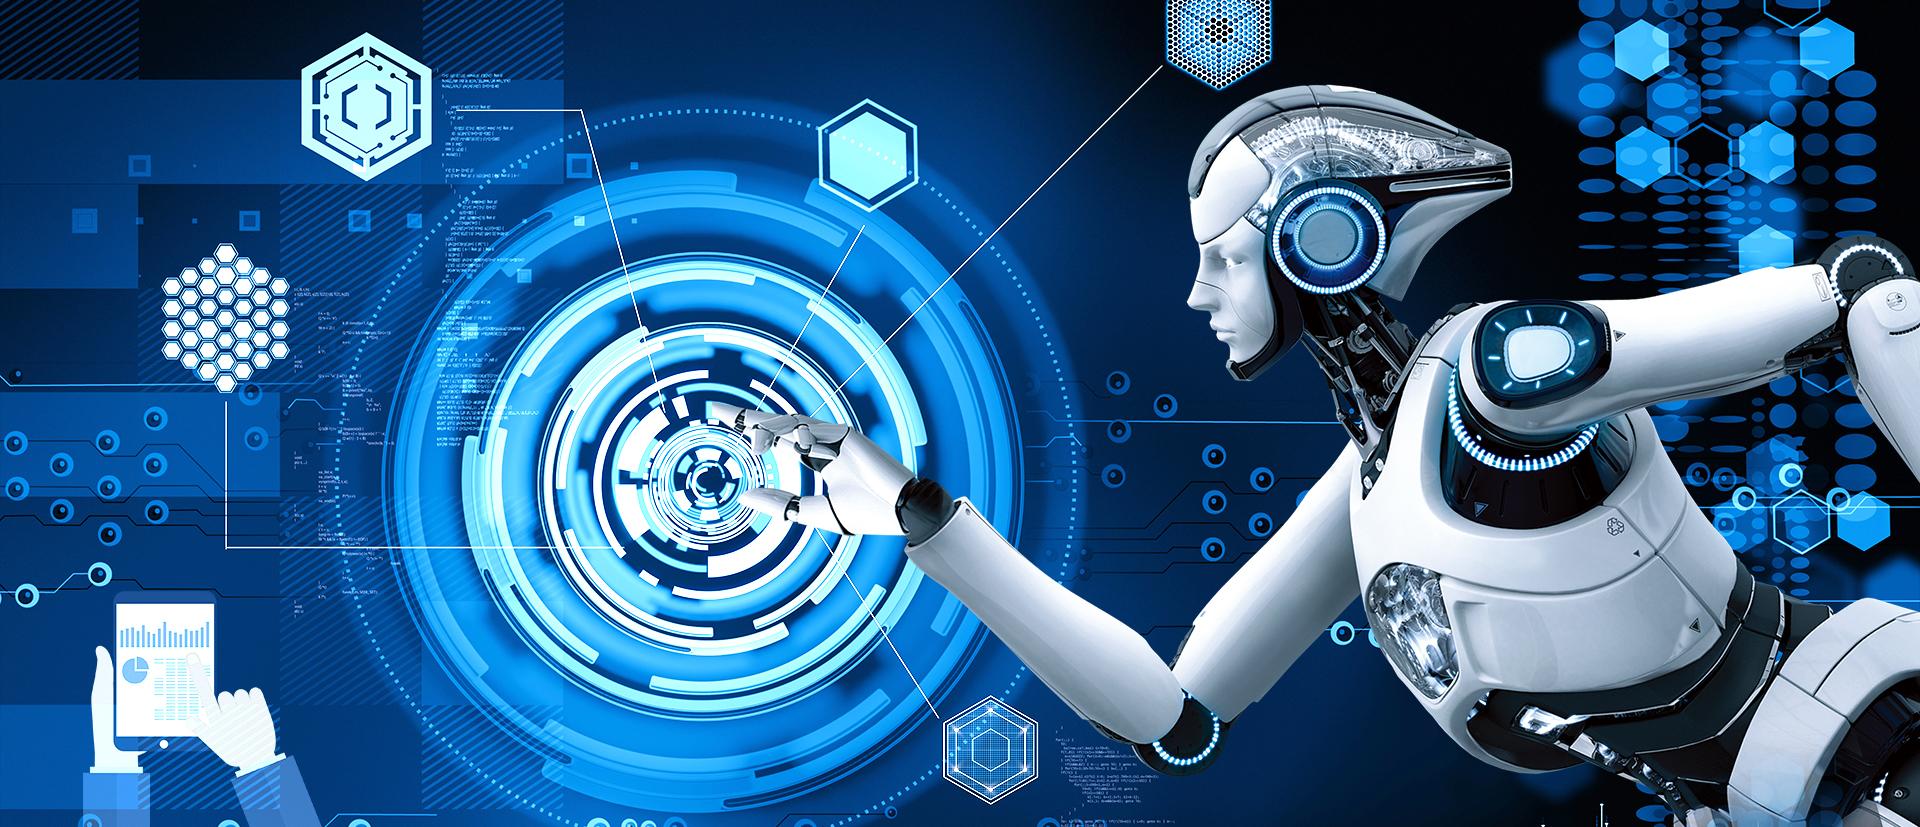 Creative Technology Smart Robot Blue Background, Creative ...